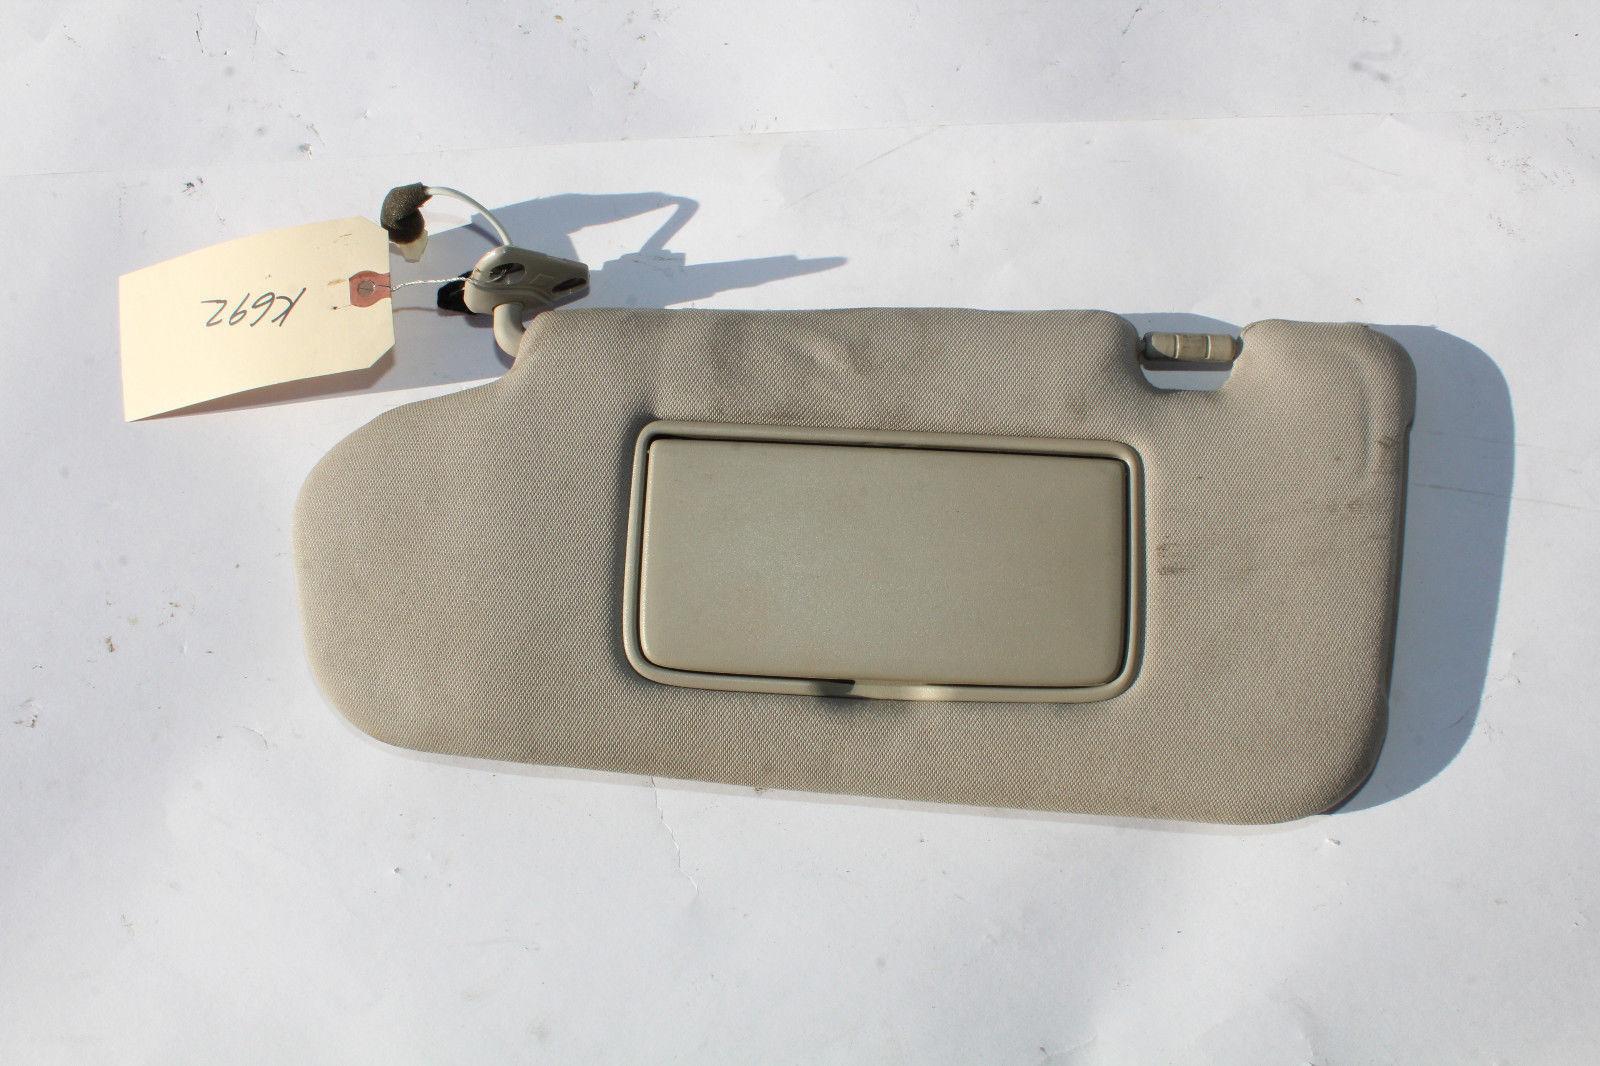 2003-2008 INFINITI FX35 DRIVER SIDE TAN CLOTH SUN VISOR K692 - $88.19